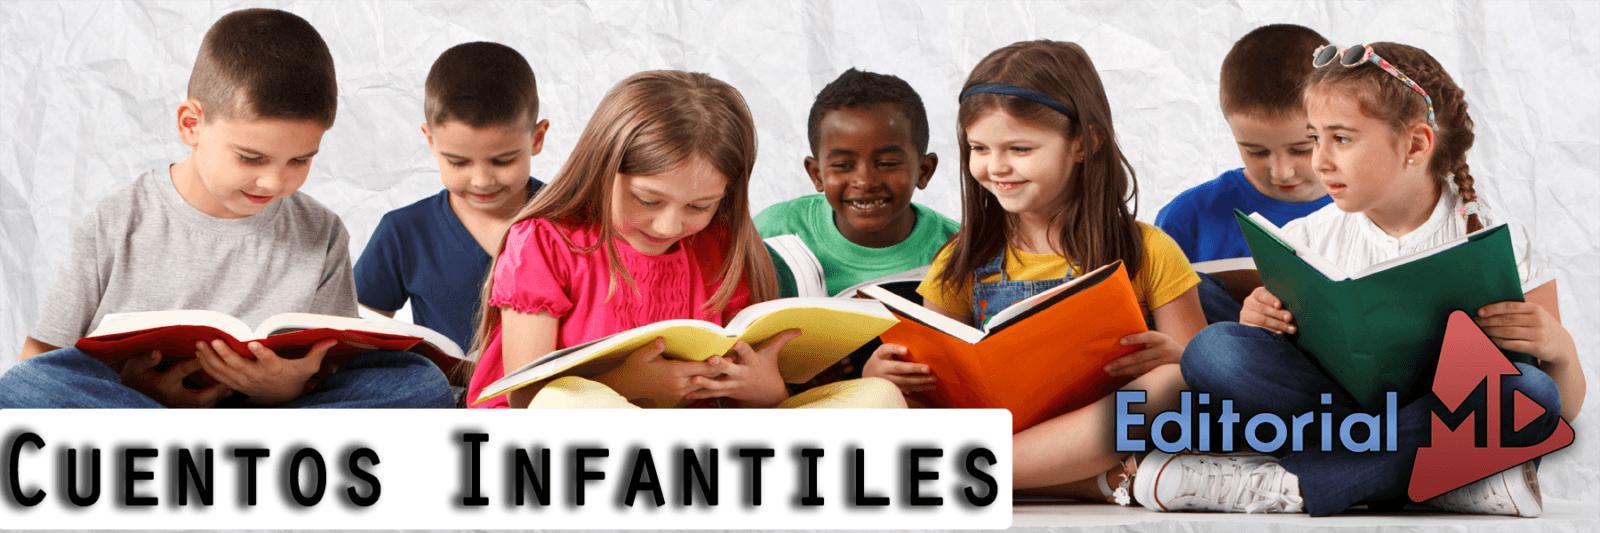 Cuentos Infantiles banner